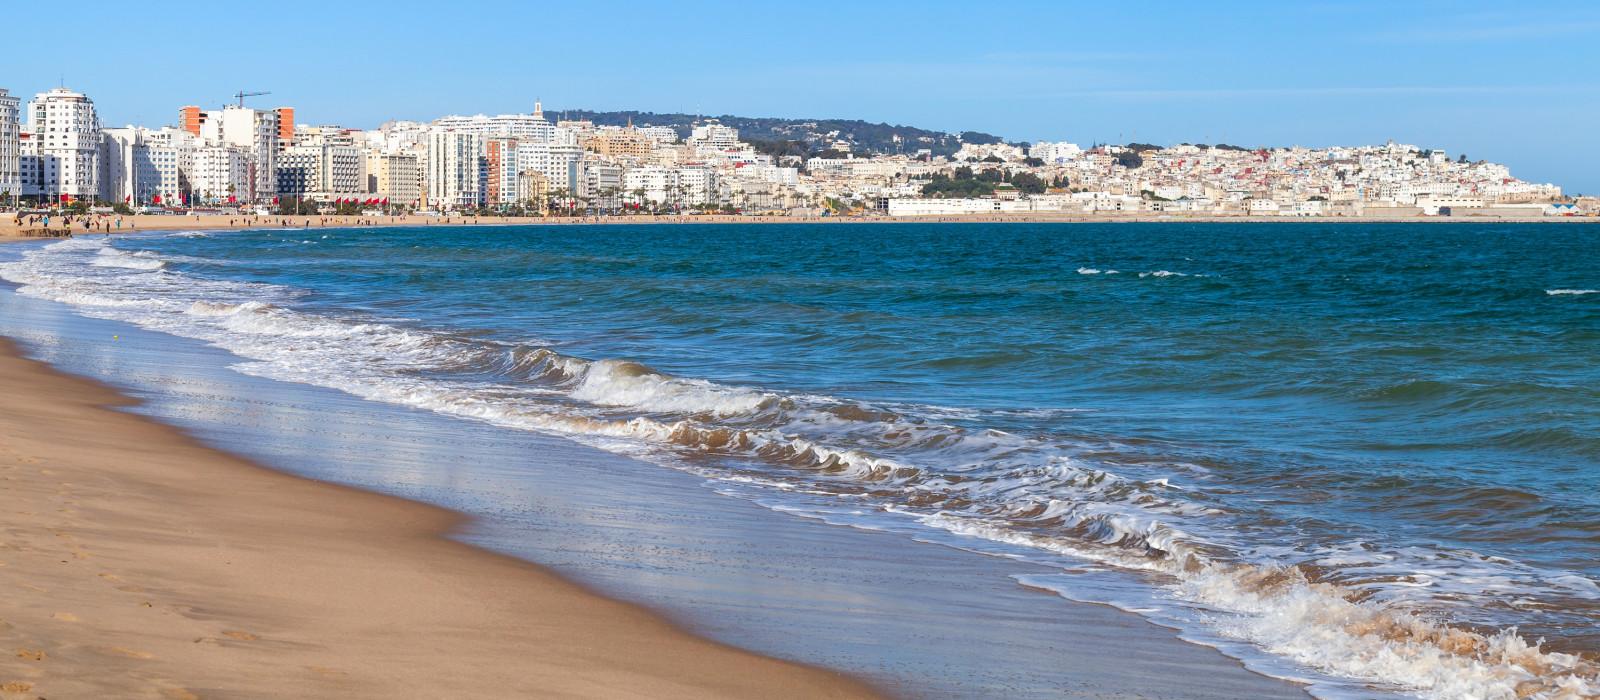 Destination Tangier Morocco